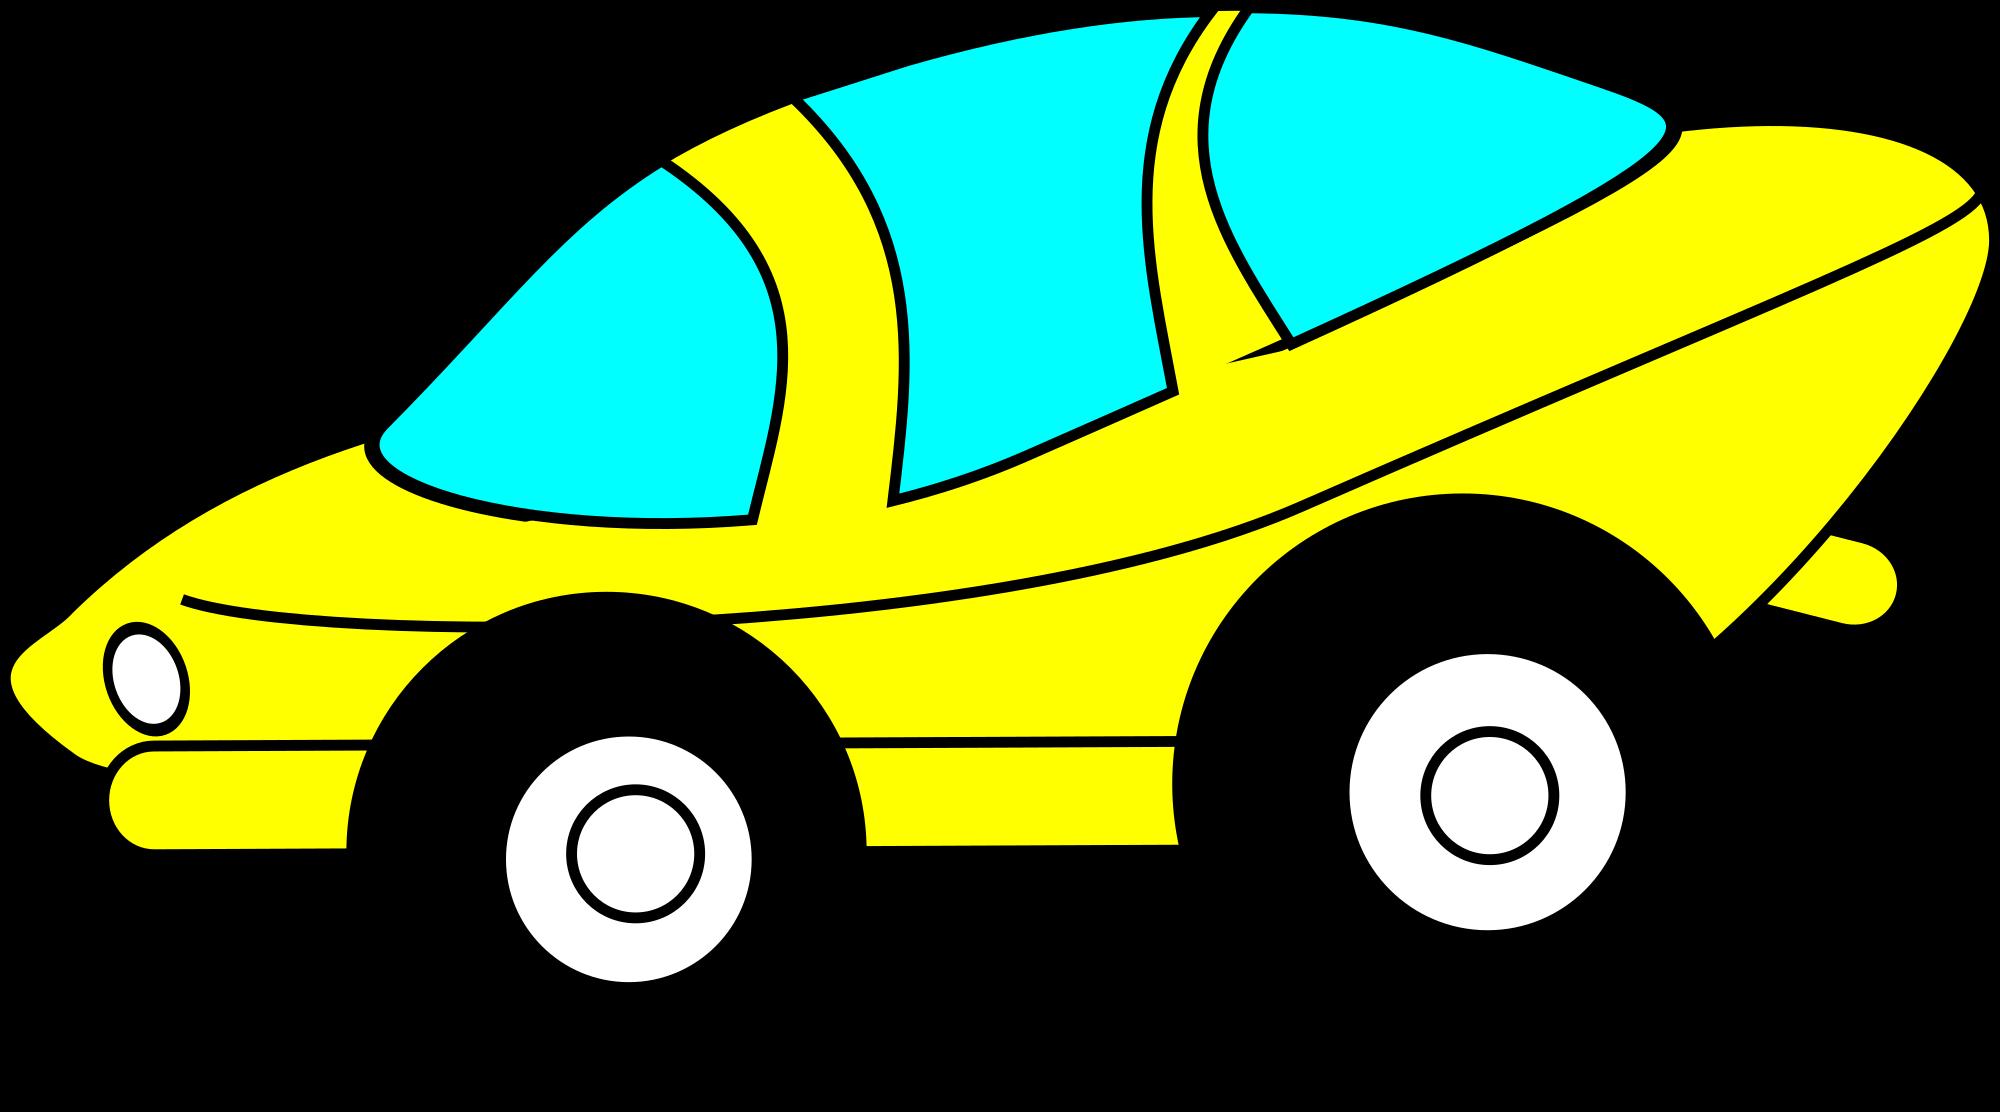 2000x1112 Cartoon Clipart Of Cars